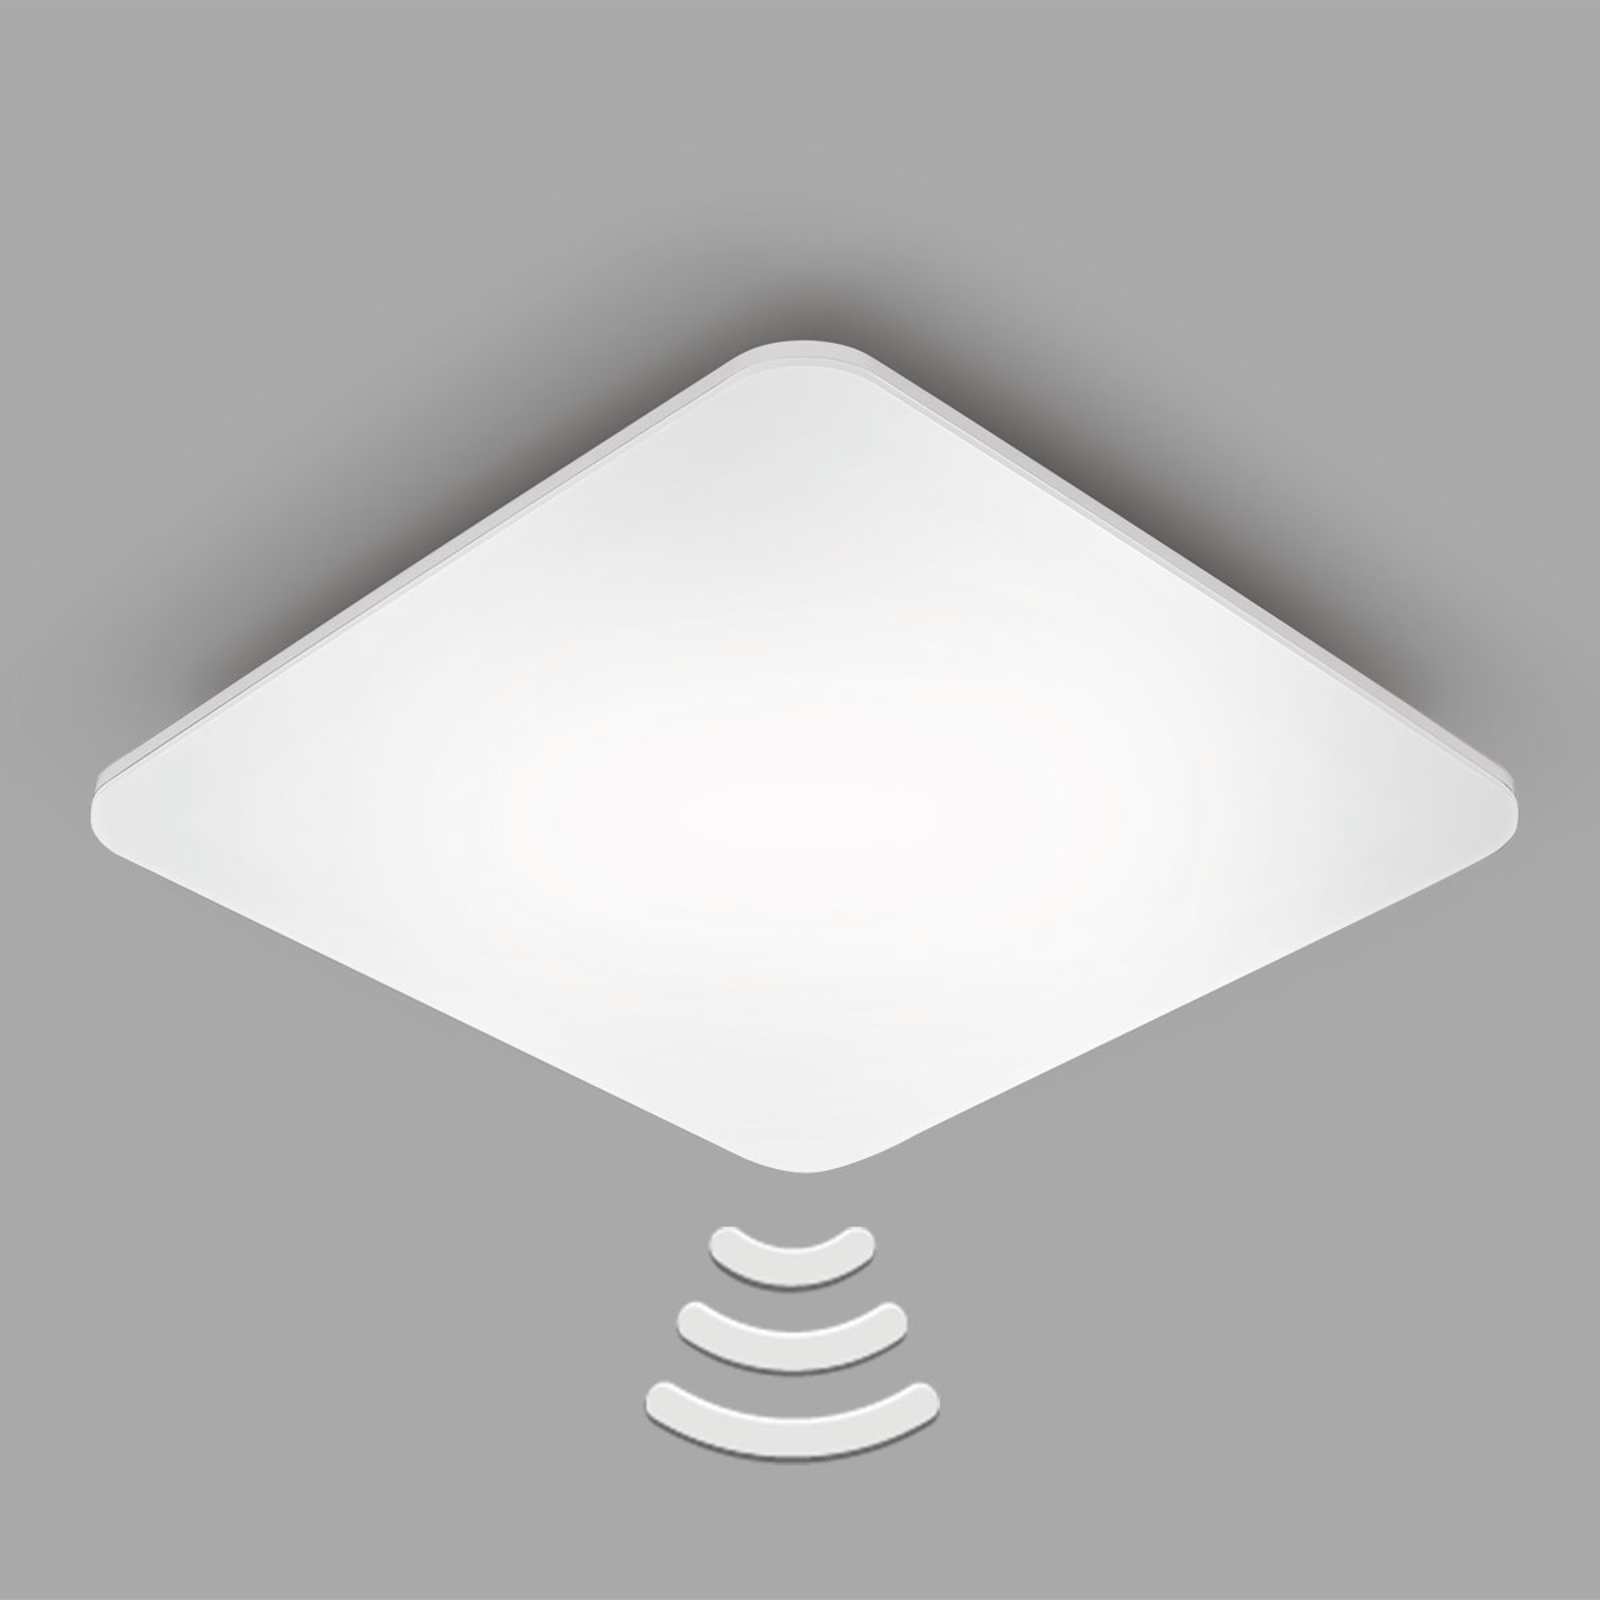 Acquista STEINEL RS Pro LED Q1 plafoniera sensore HF bianco